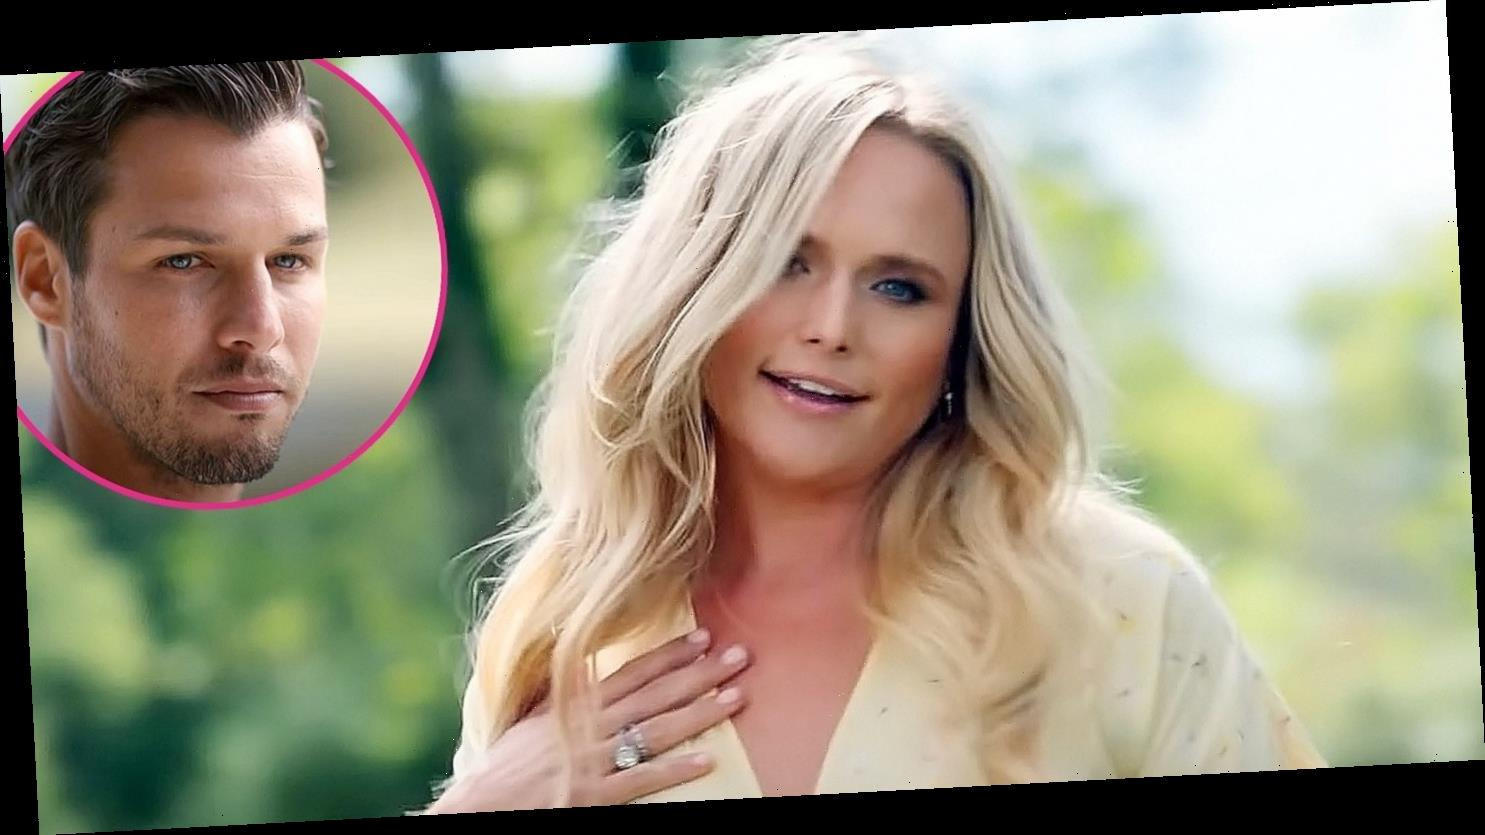 Miranda Lambert Had Husband Brendan in New Video Because 'He's Really Pretty'